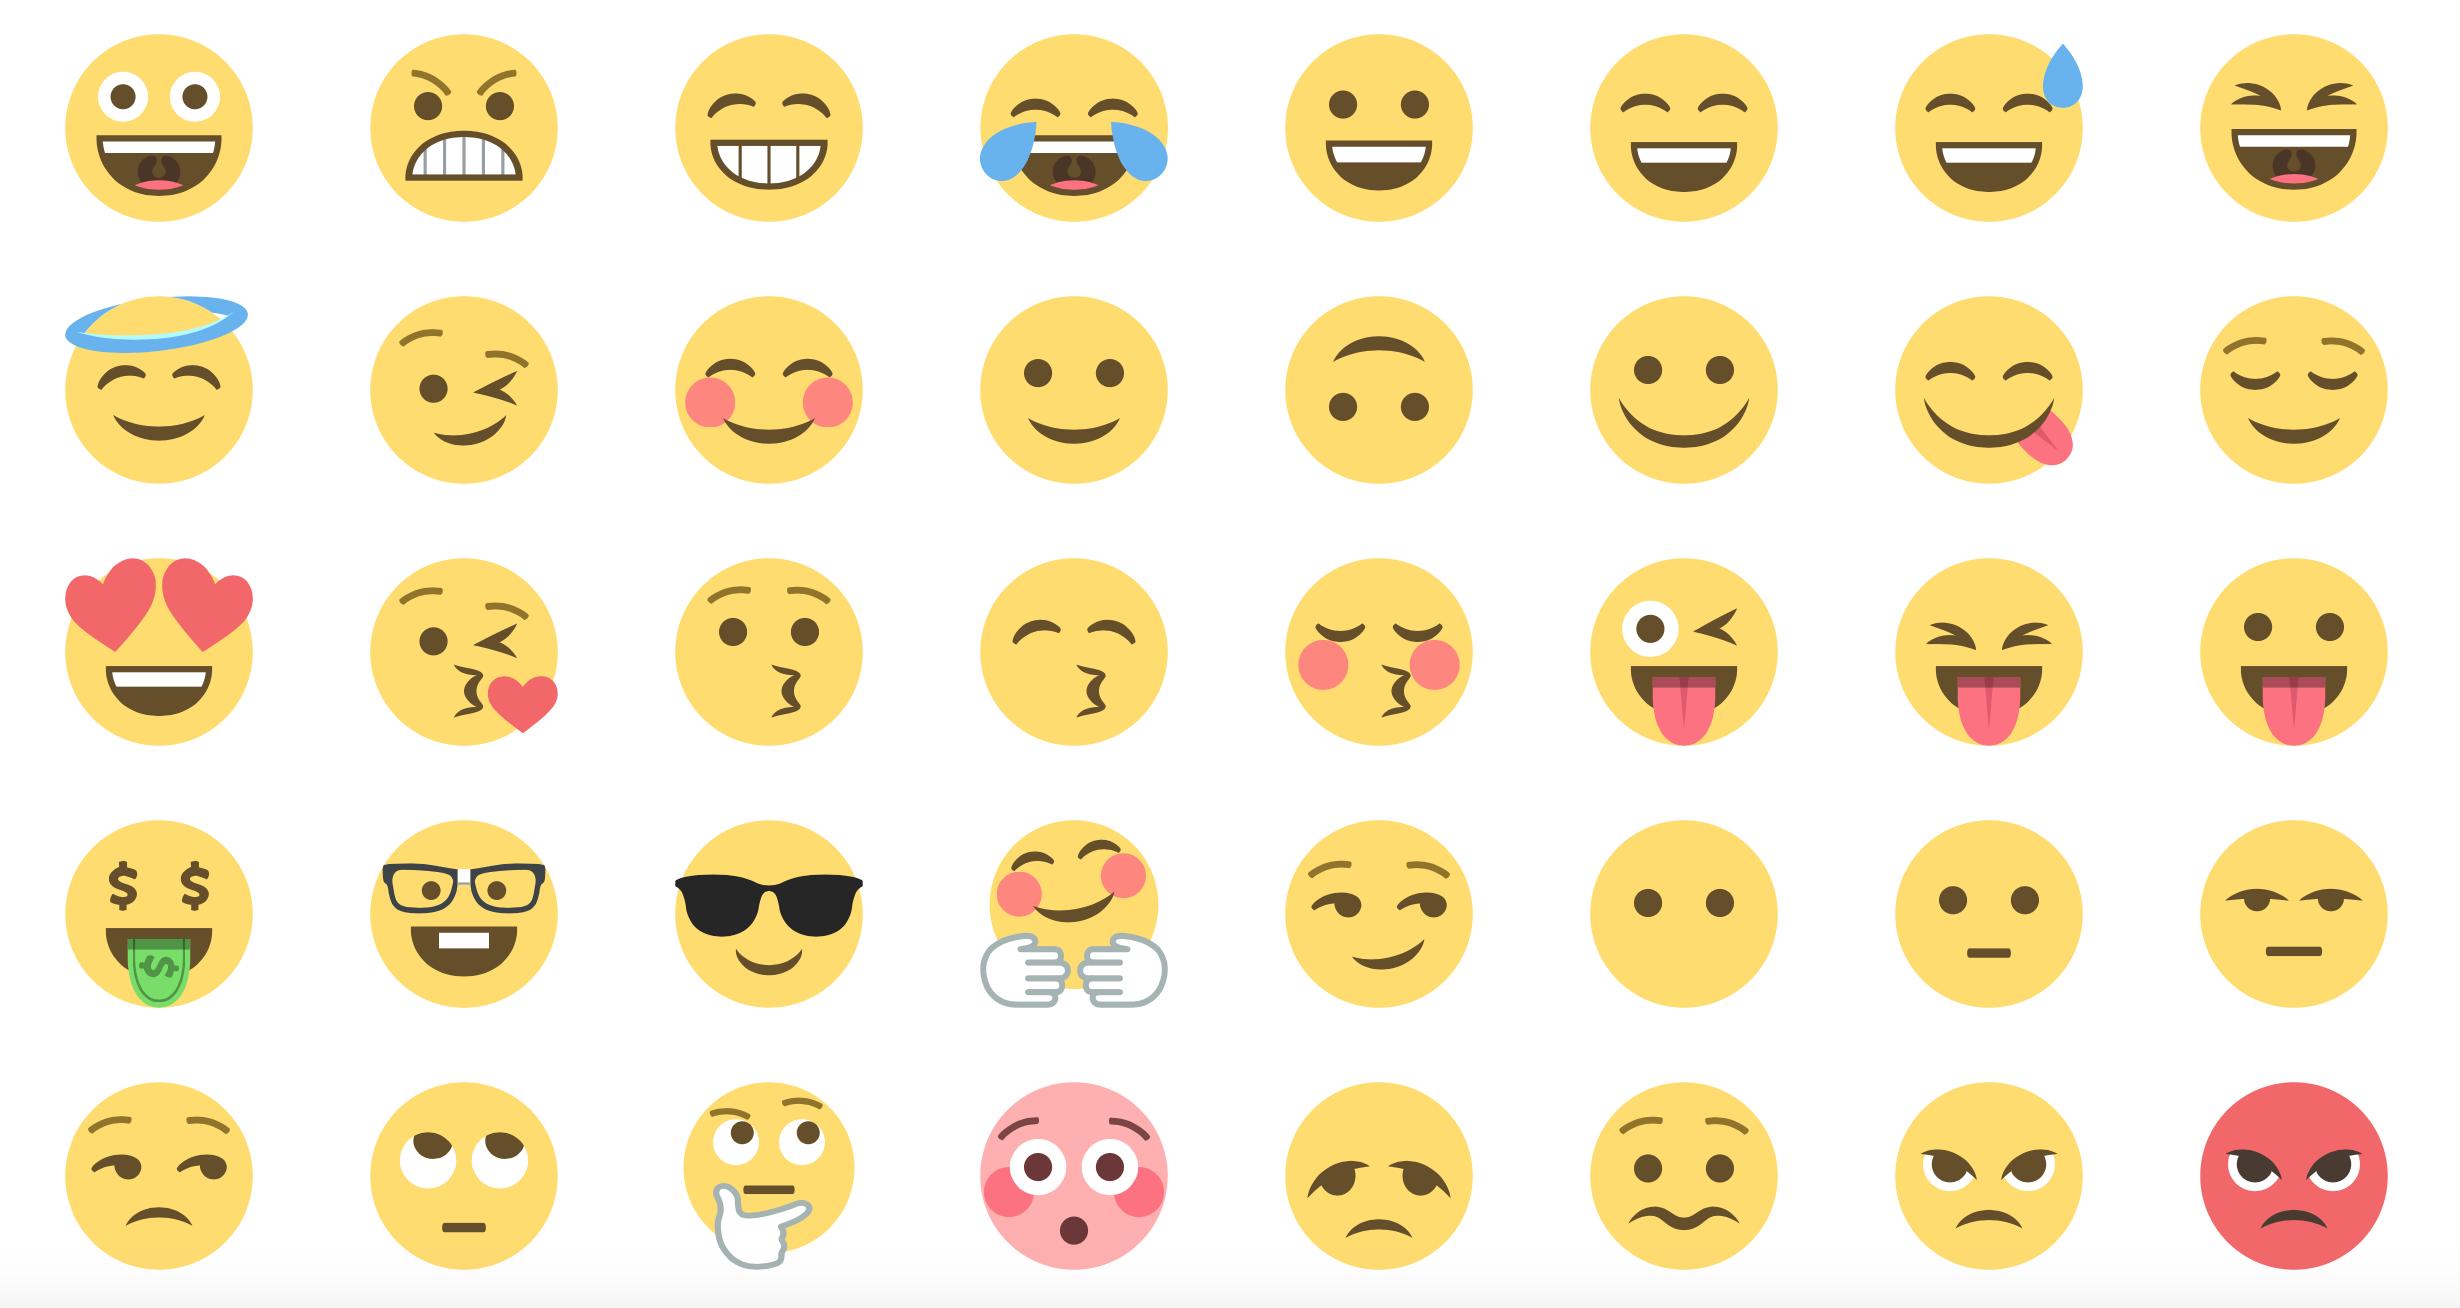 Emoji One Launches 2016 Collection Emoji Monkey Emoji Product Launch